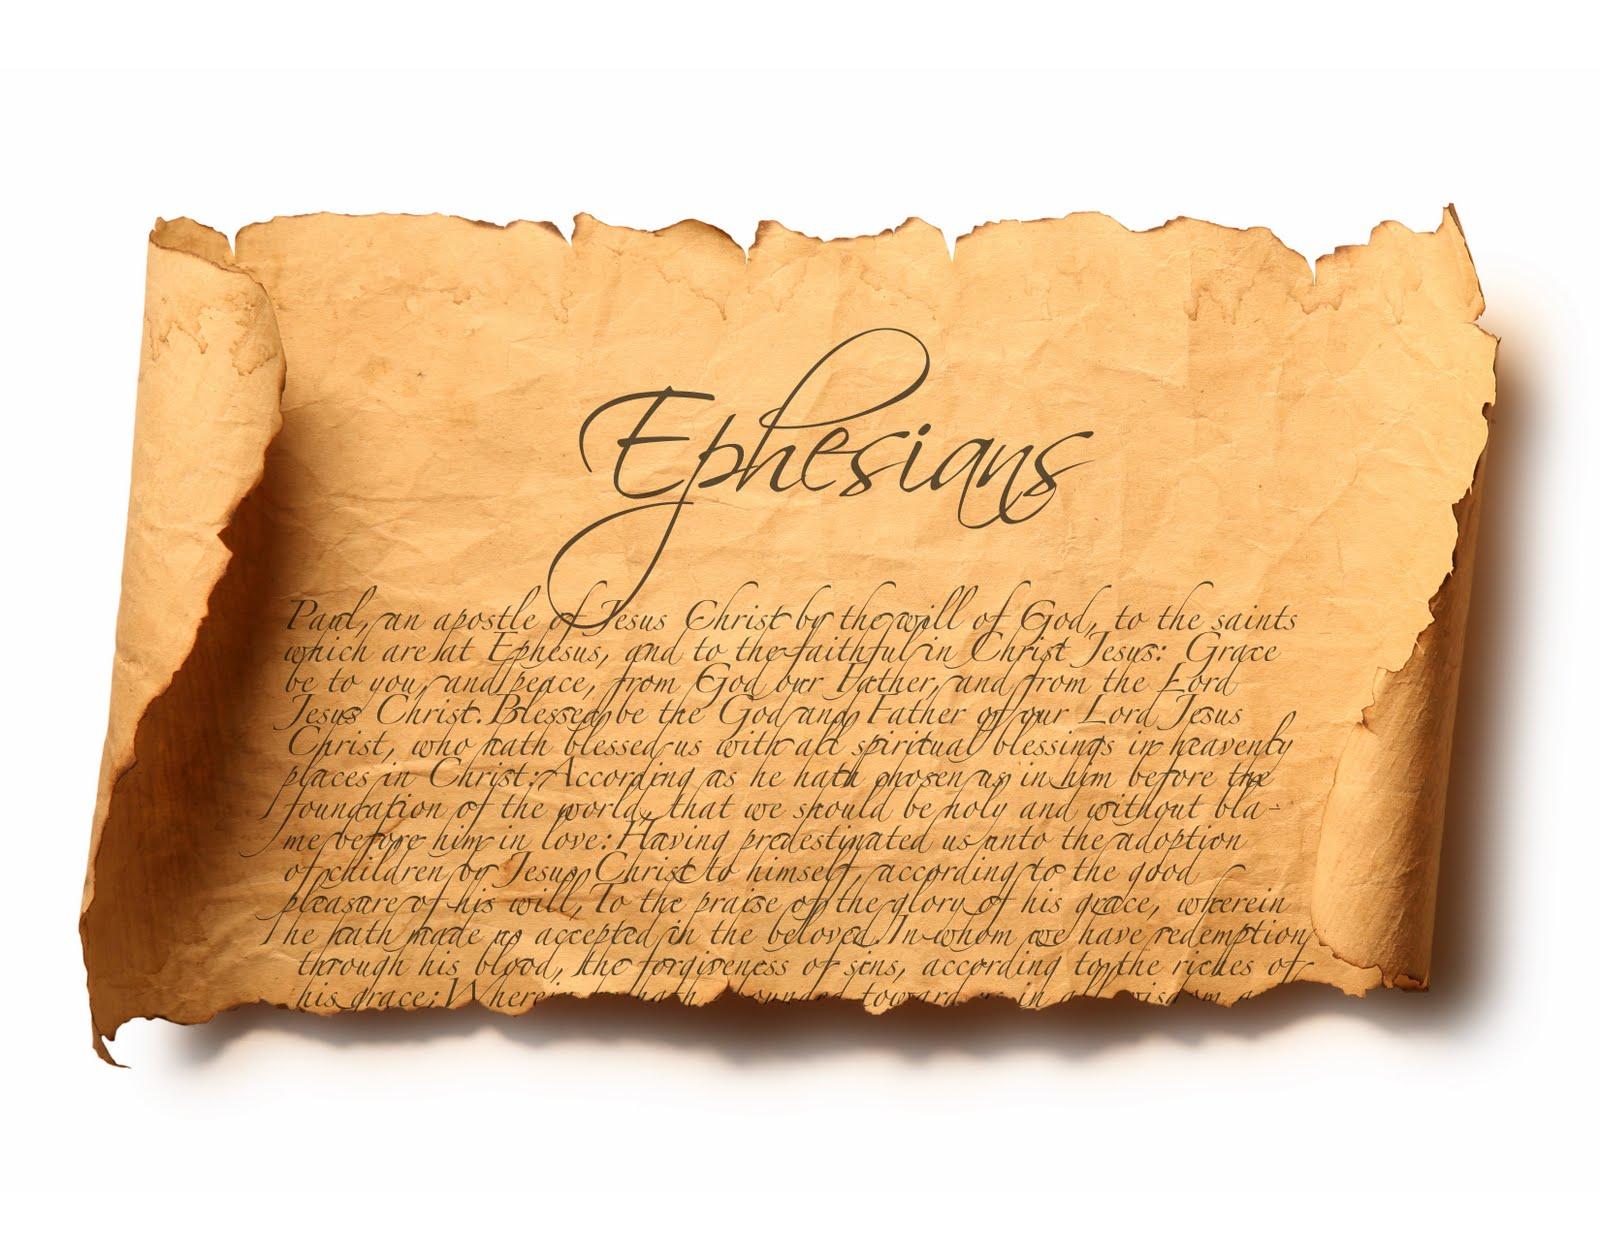 Allan R Bevere Was Ephesians a Circular Letter